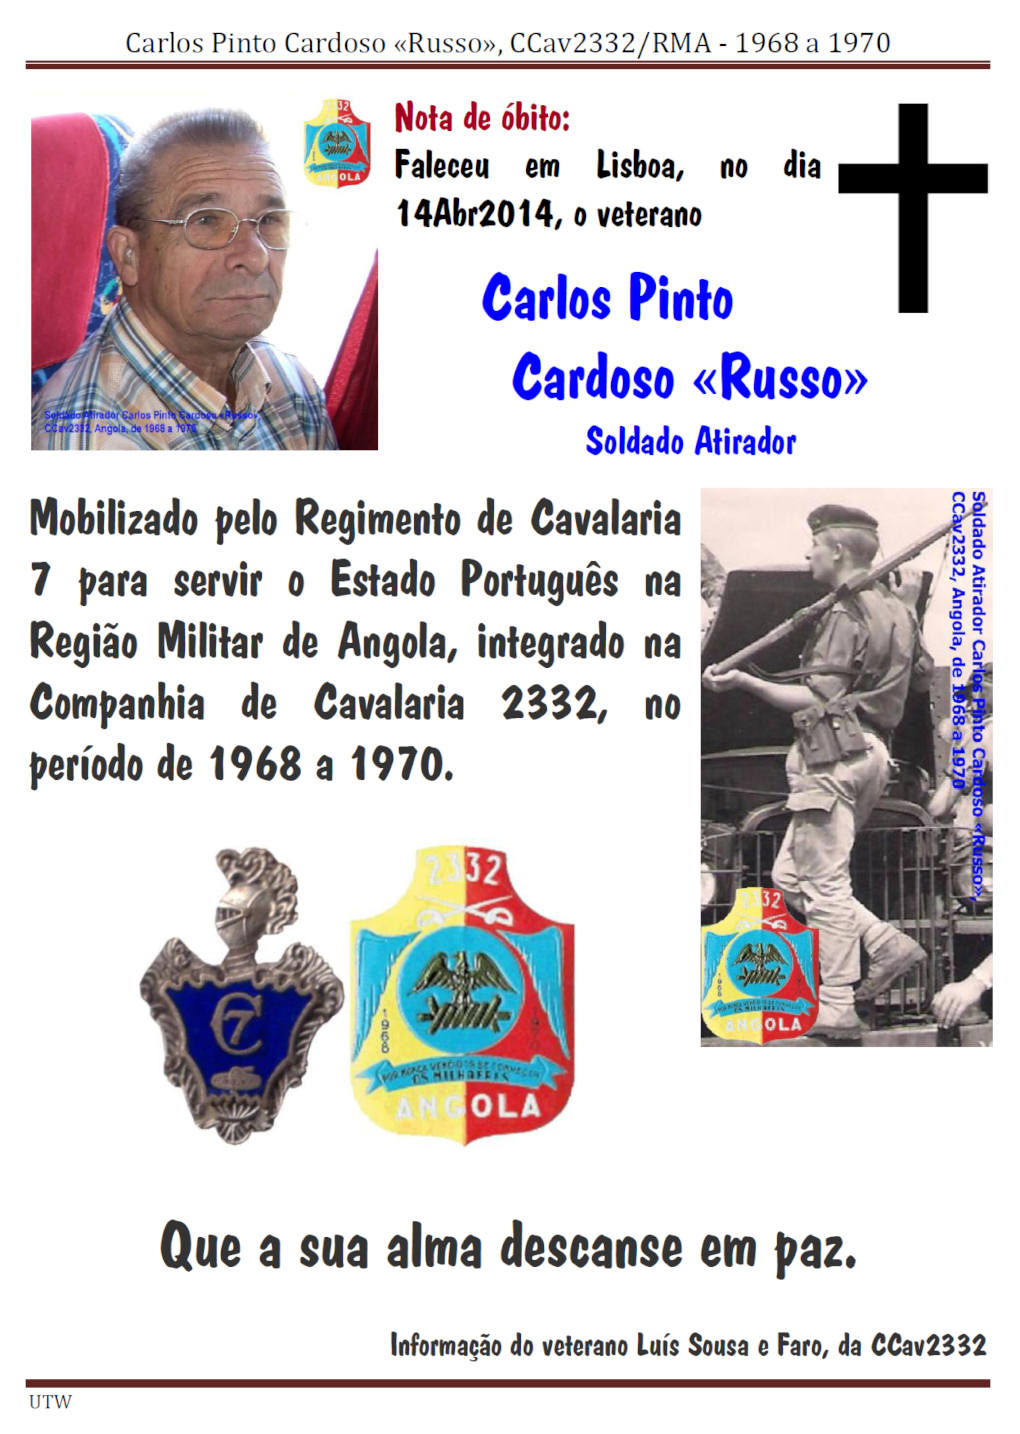 Faleceu o veterano Carlos Pinto Cardoso «Russo», da CCav2332 - 14Abr2014 Carlos14